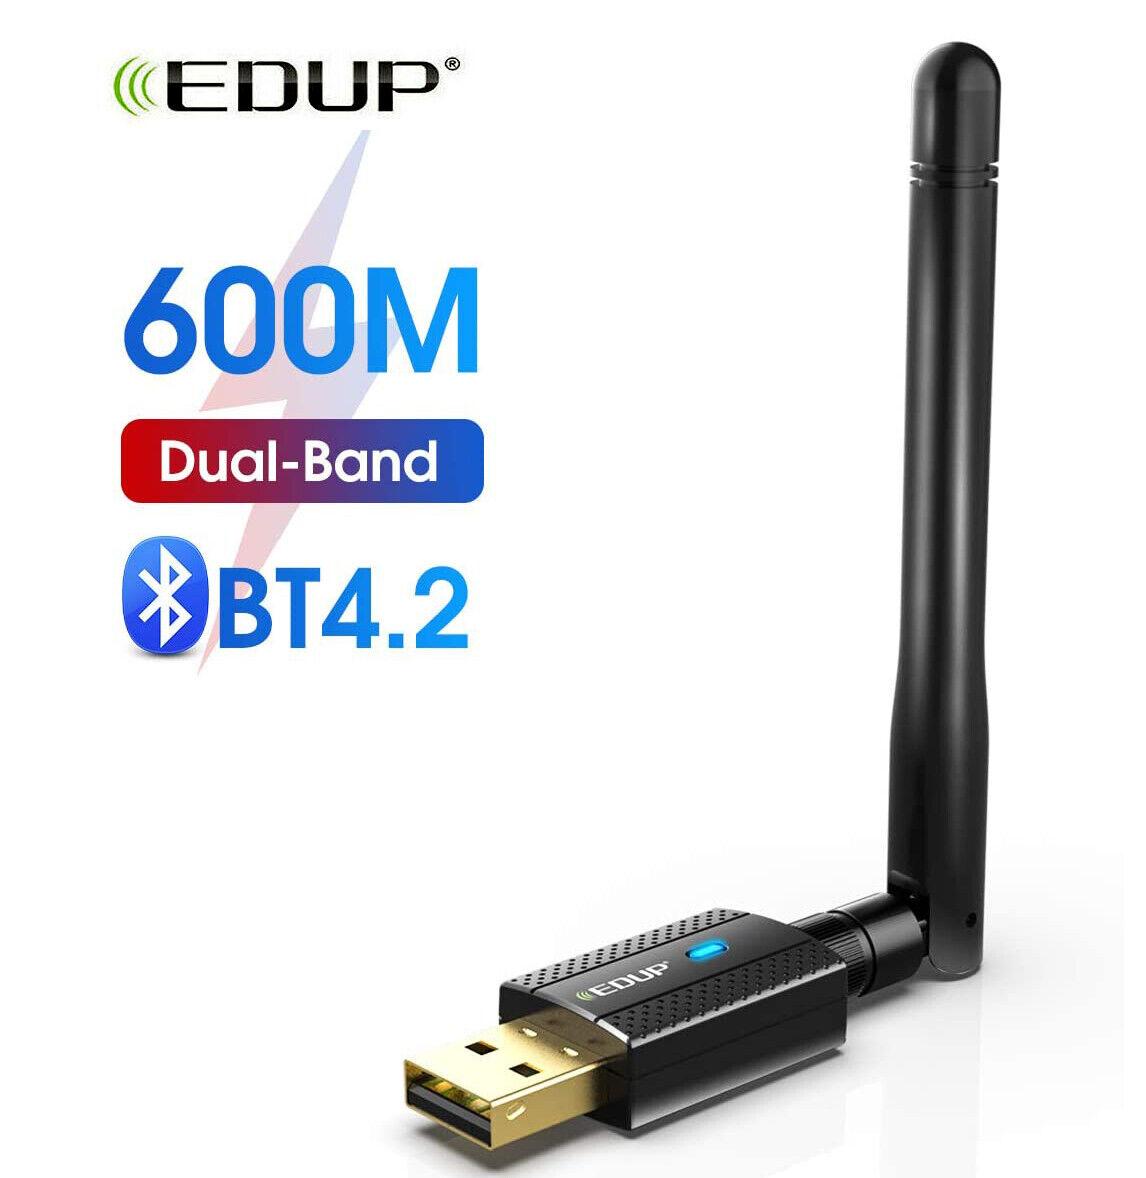 600Mbps Wireless Internet Wifi Range Extender Bluetooth USB